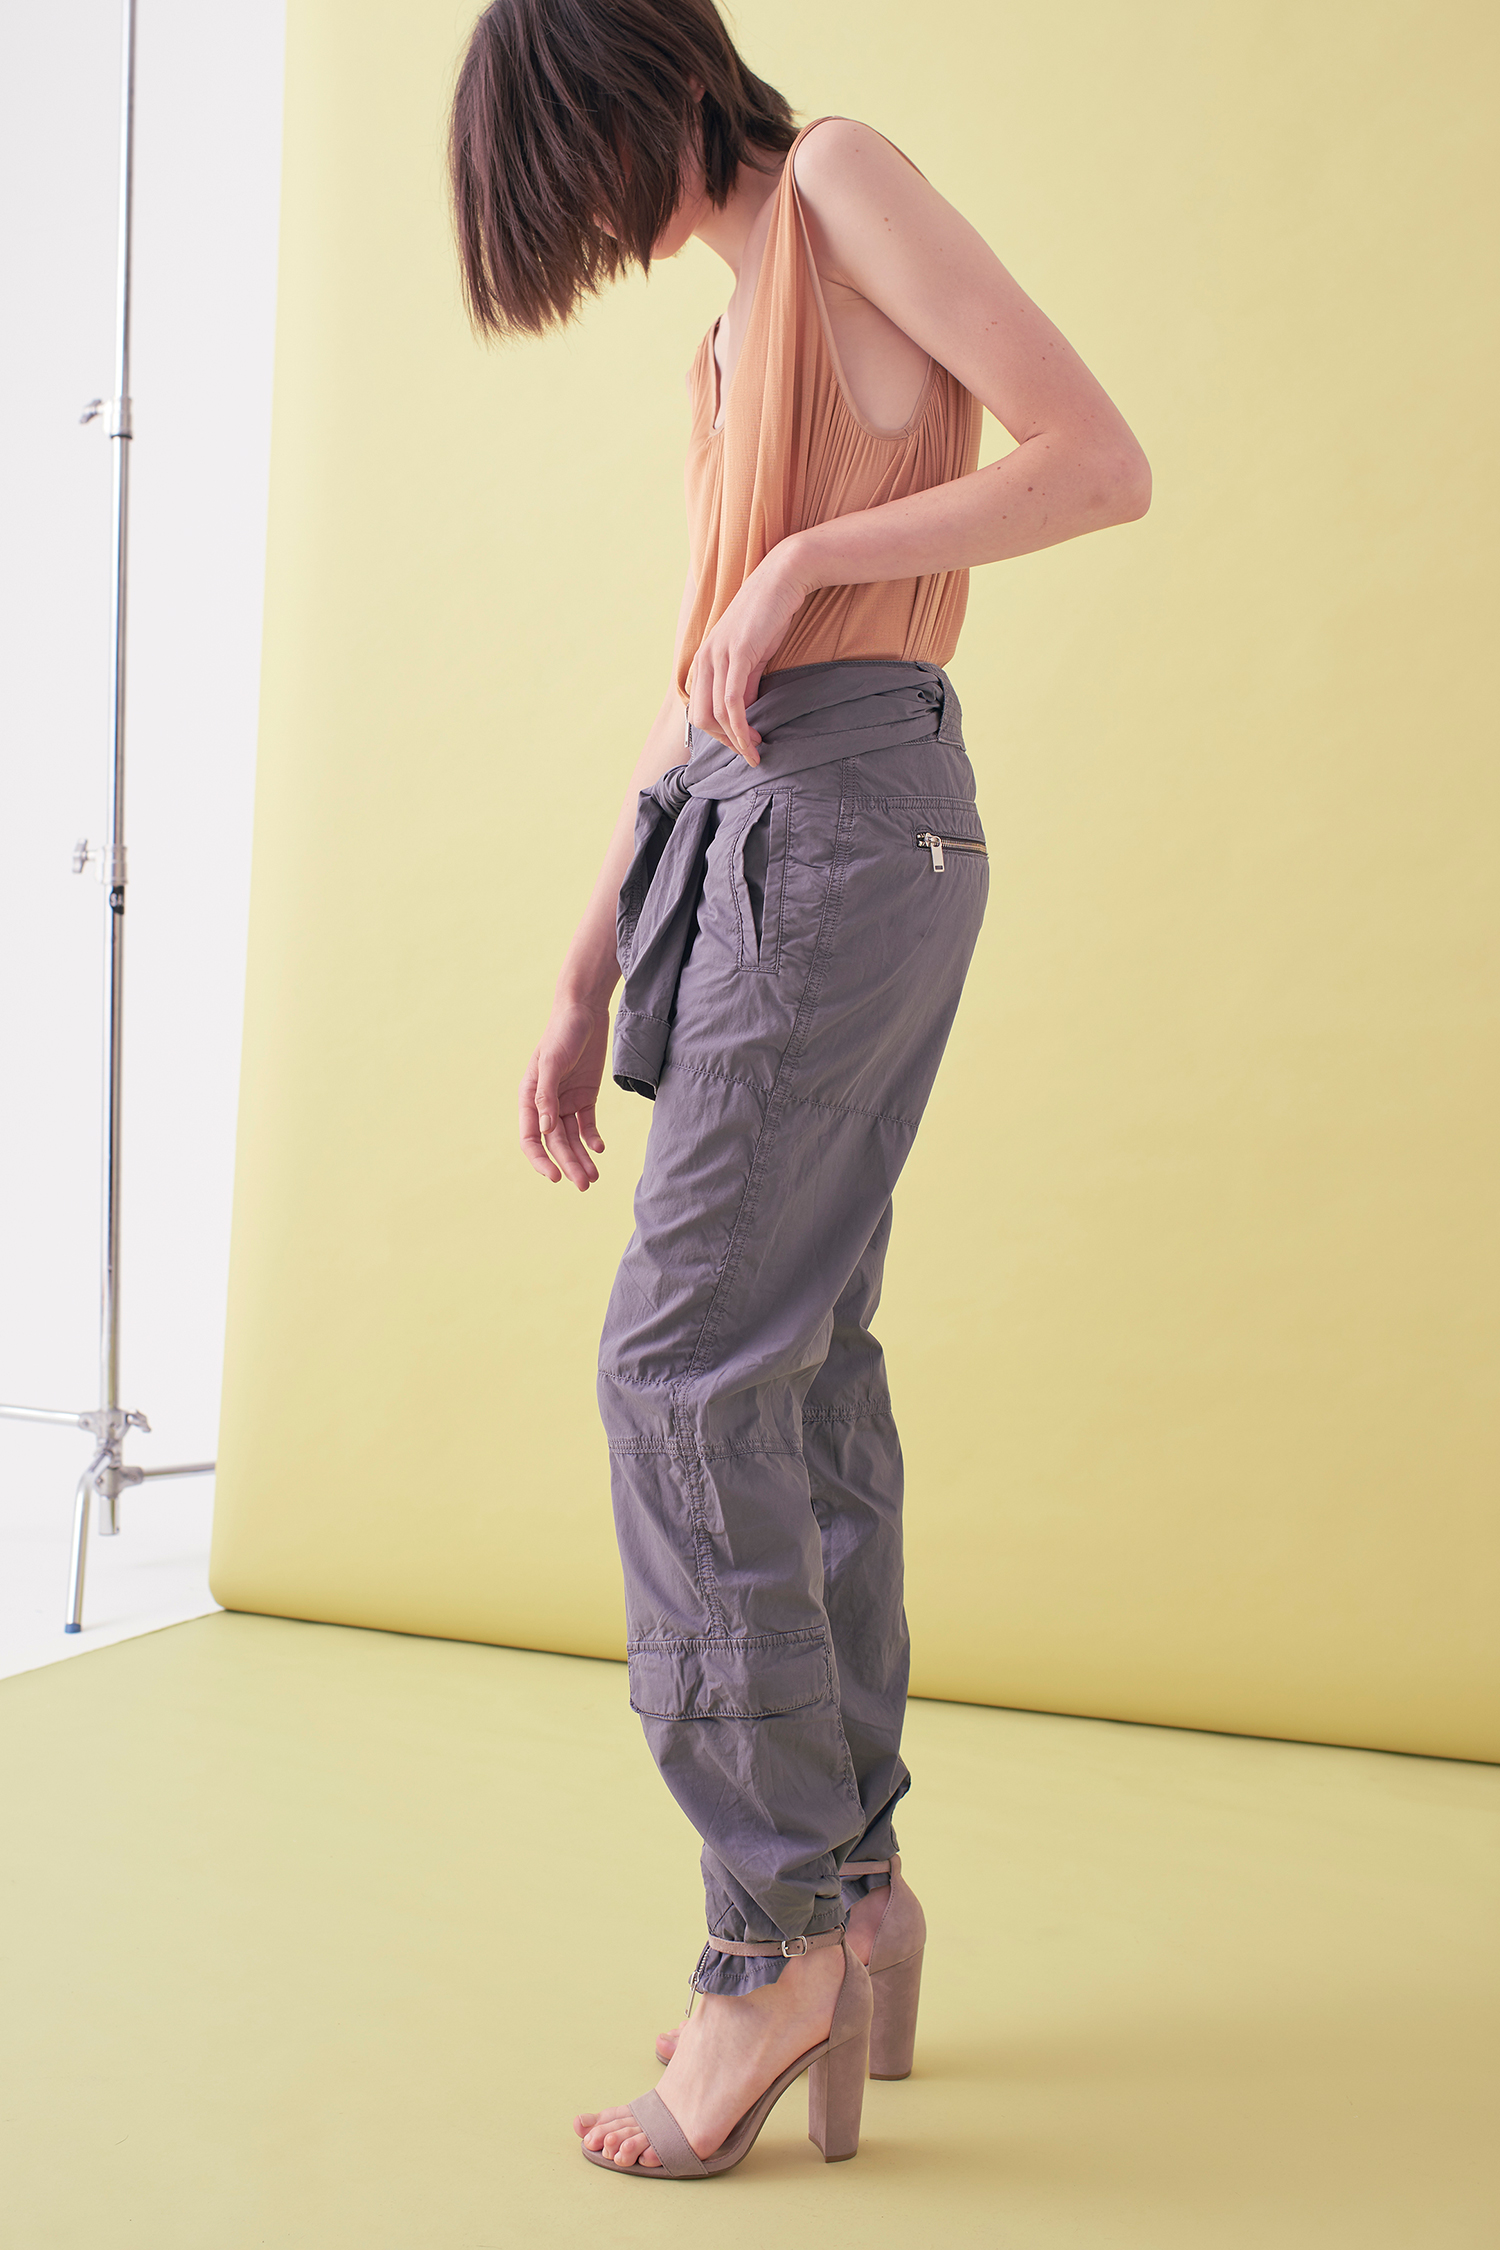 Sarah_Swann_SS17_38_Garment_Dyed_Rayon_Cotton_Utility_Trouser_Pewter_S.jpg